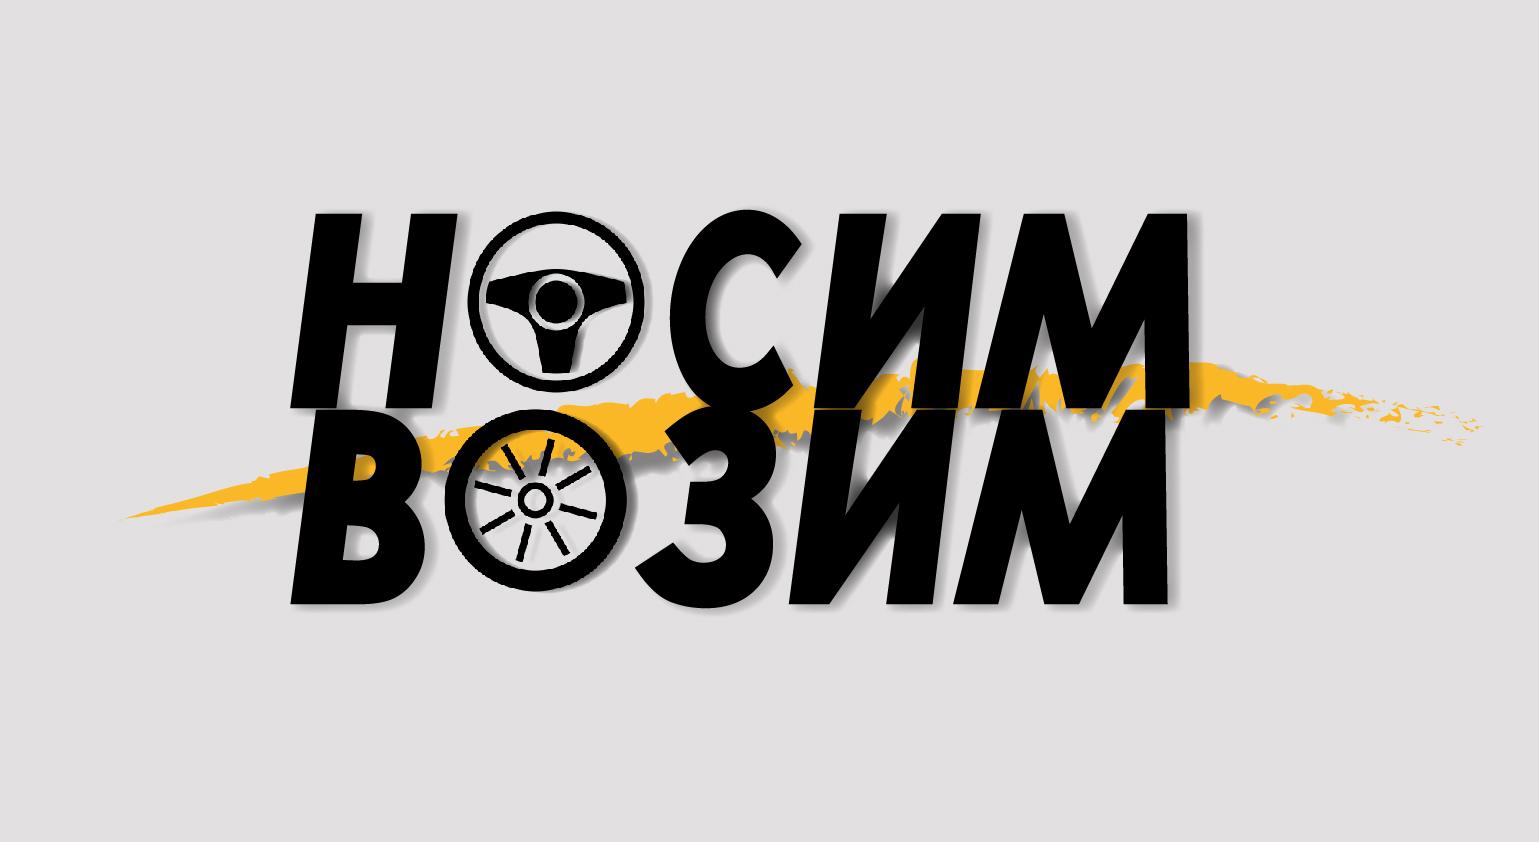 Логотип компании по перевозкам НосимВозим фото f_8845cf67d5aa95d1.jpg